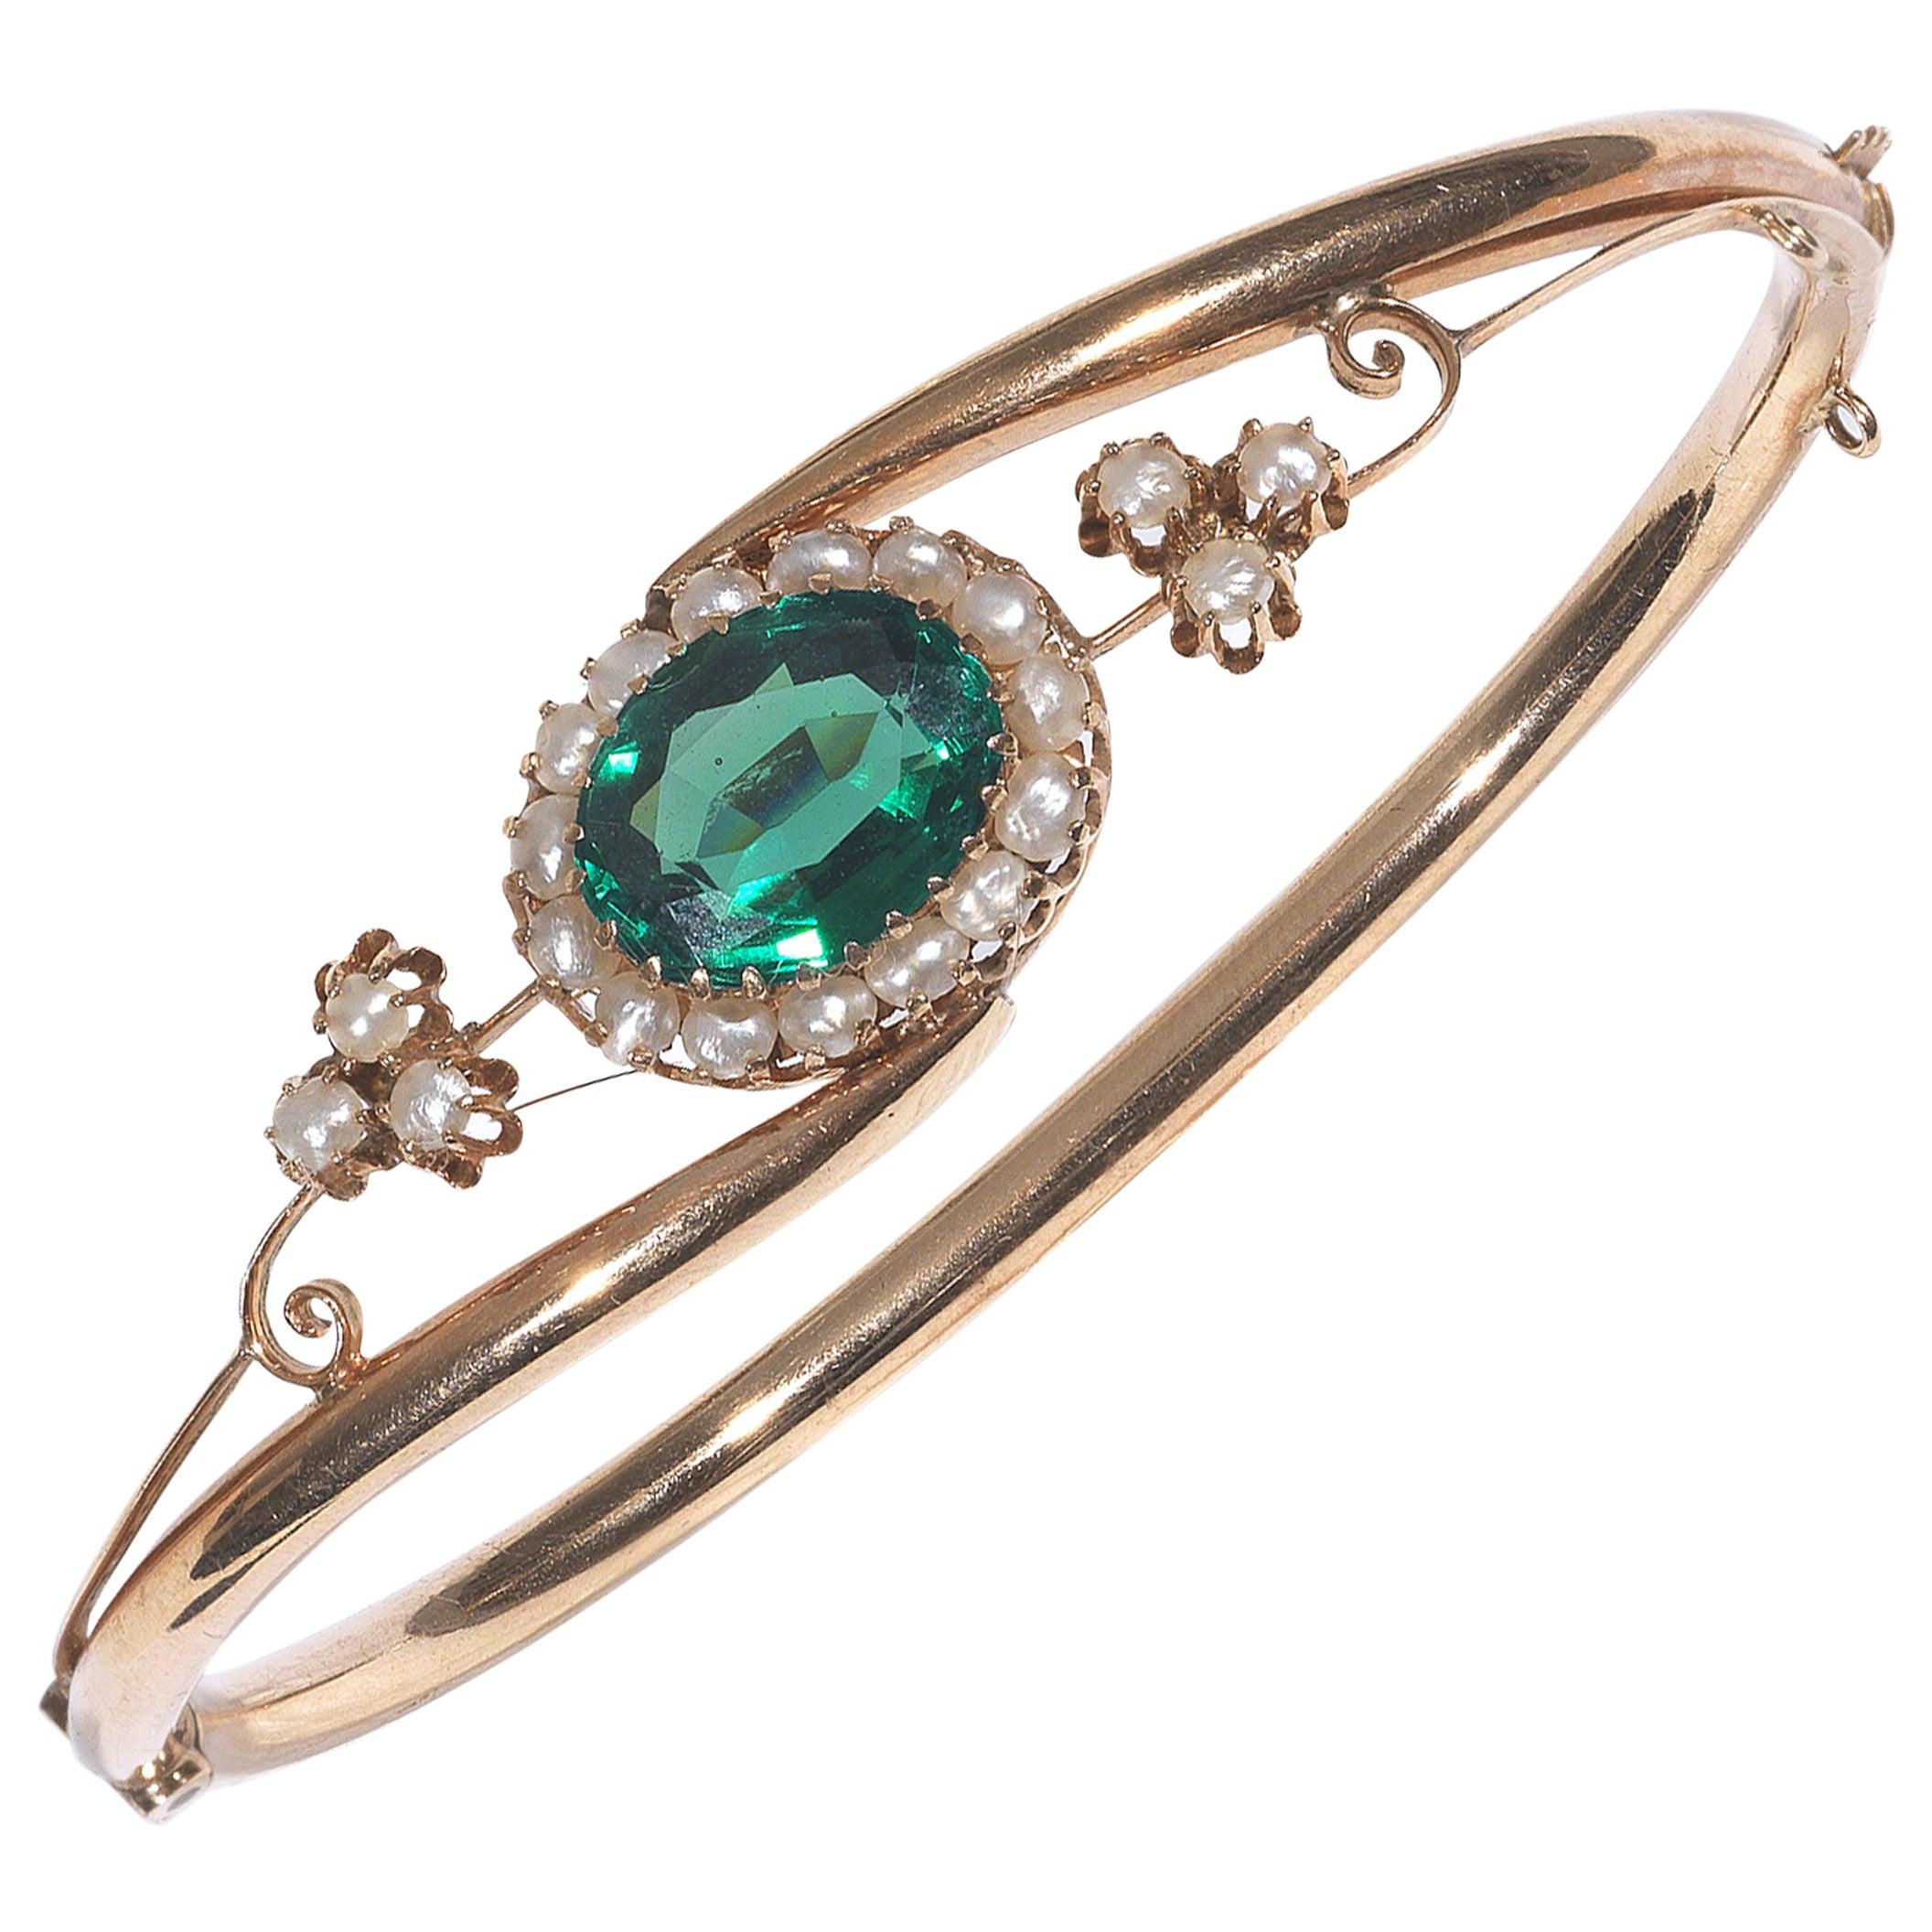 Antique Green Tourmaline Pearl Gold Bangle Bracelet